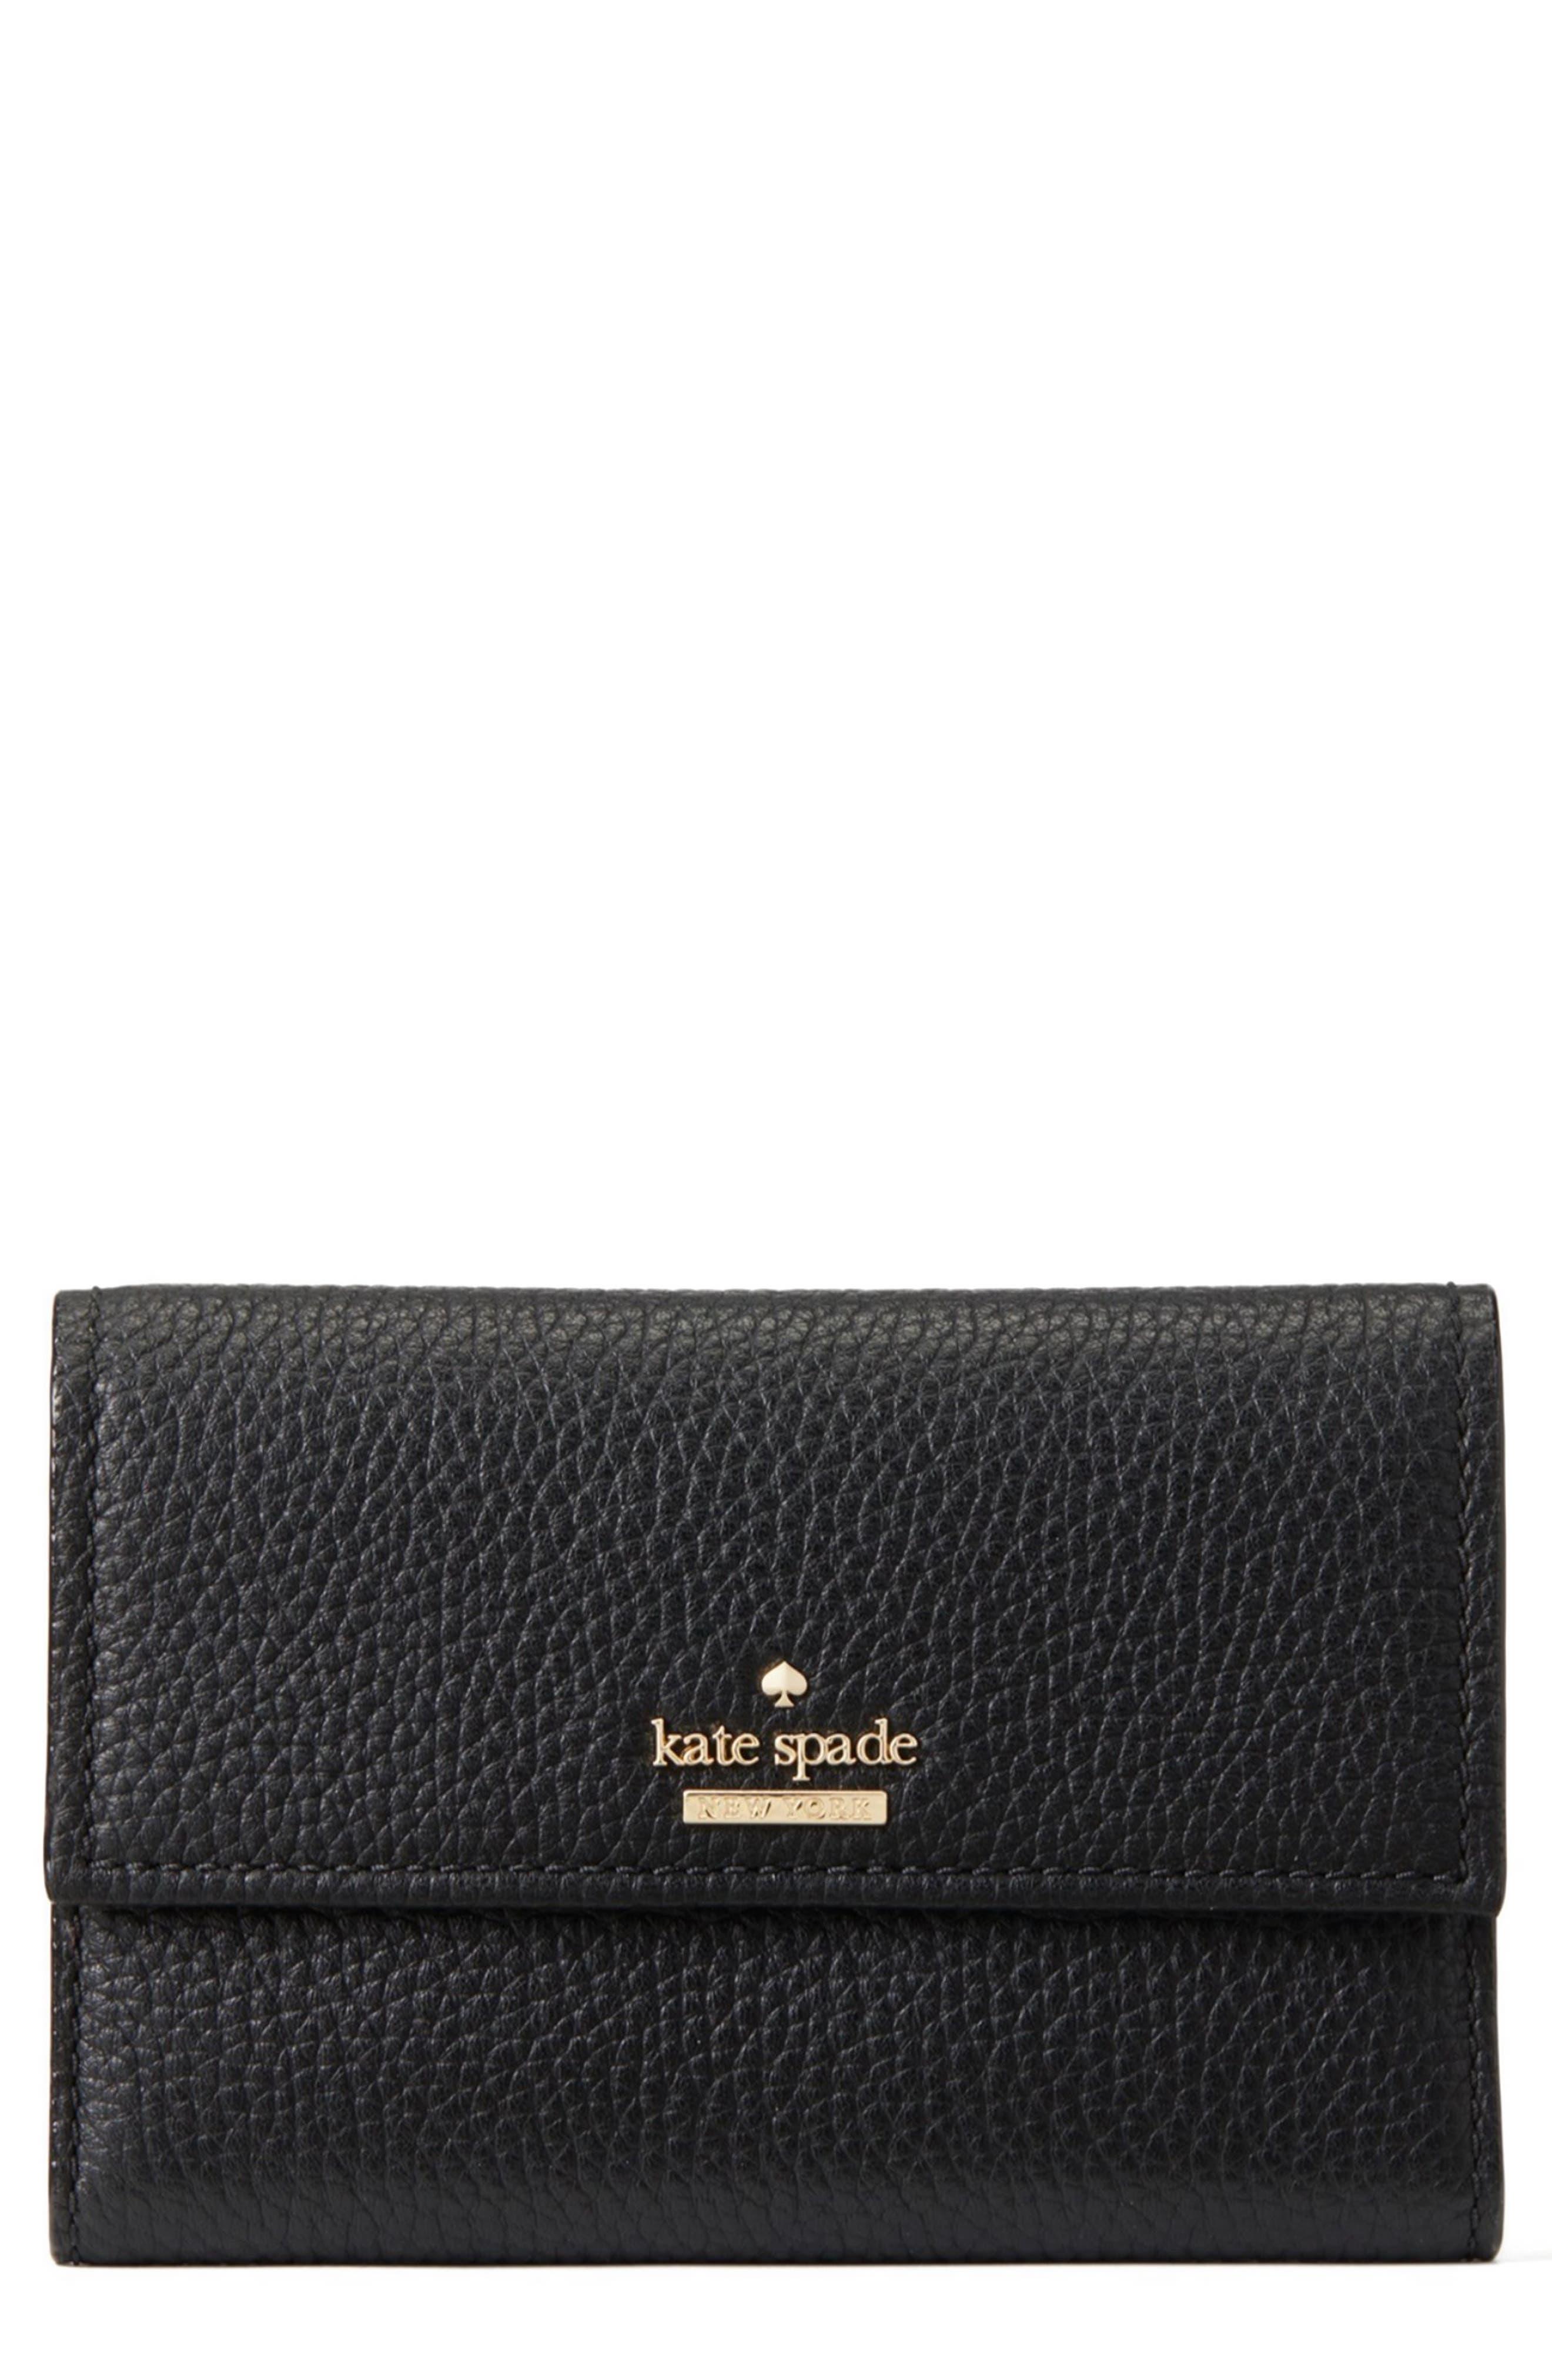 KATE SPADE NEW YORK, jackson street – meredith leather wallet, Main thumbnail 1, color, 001